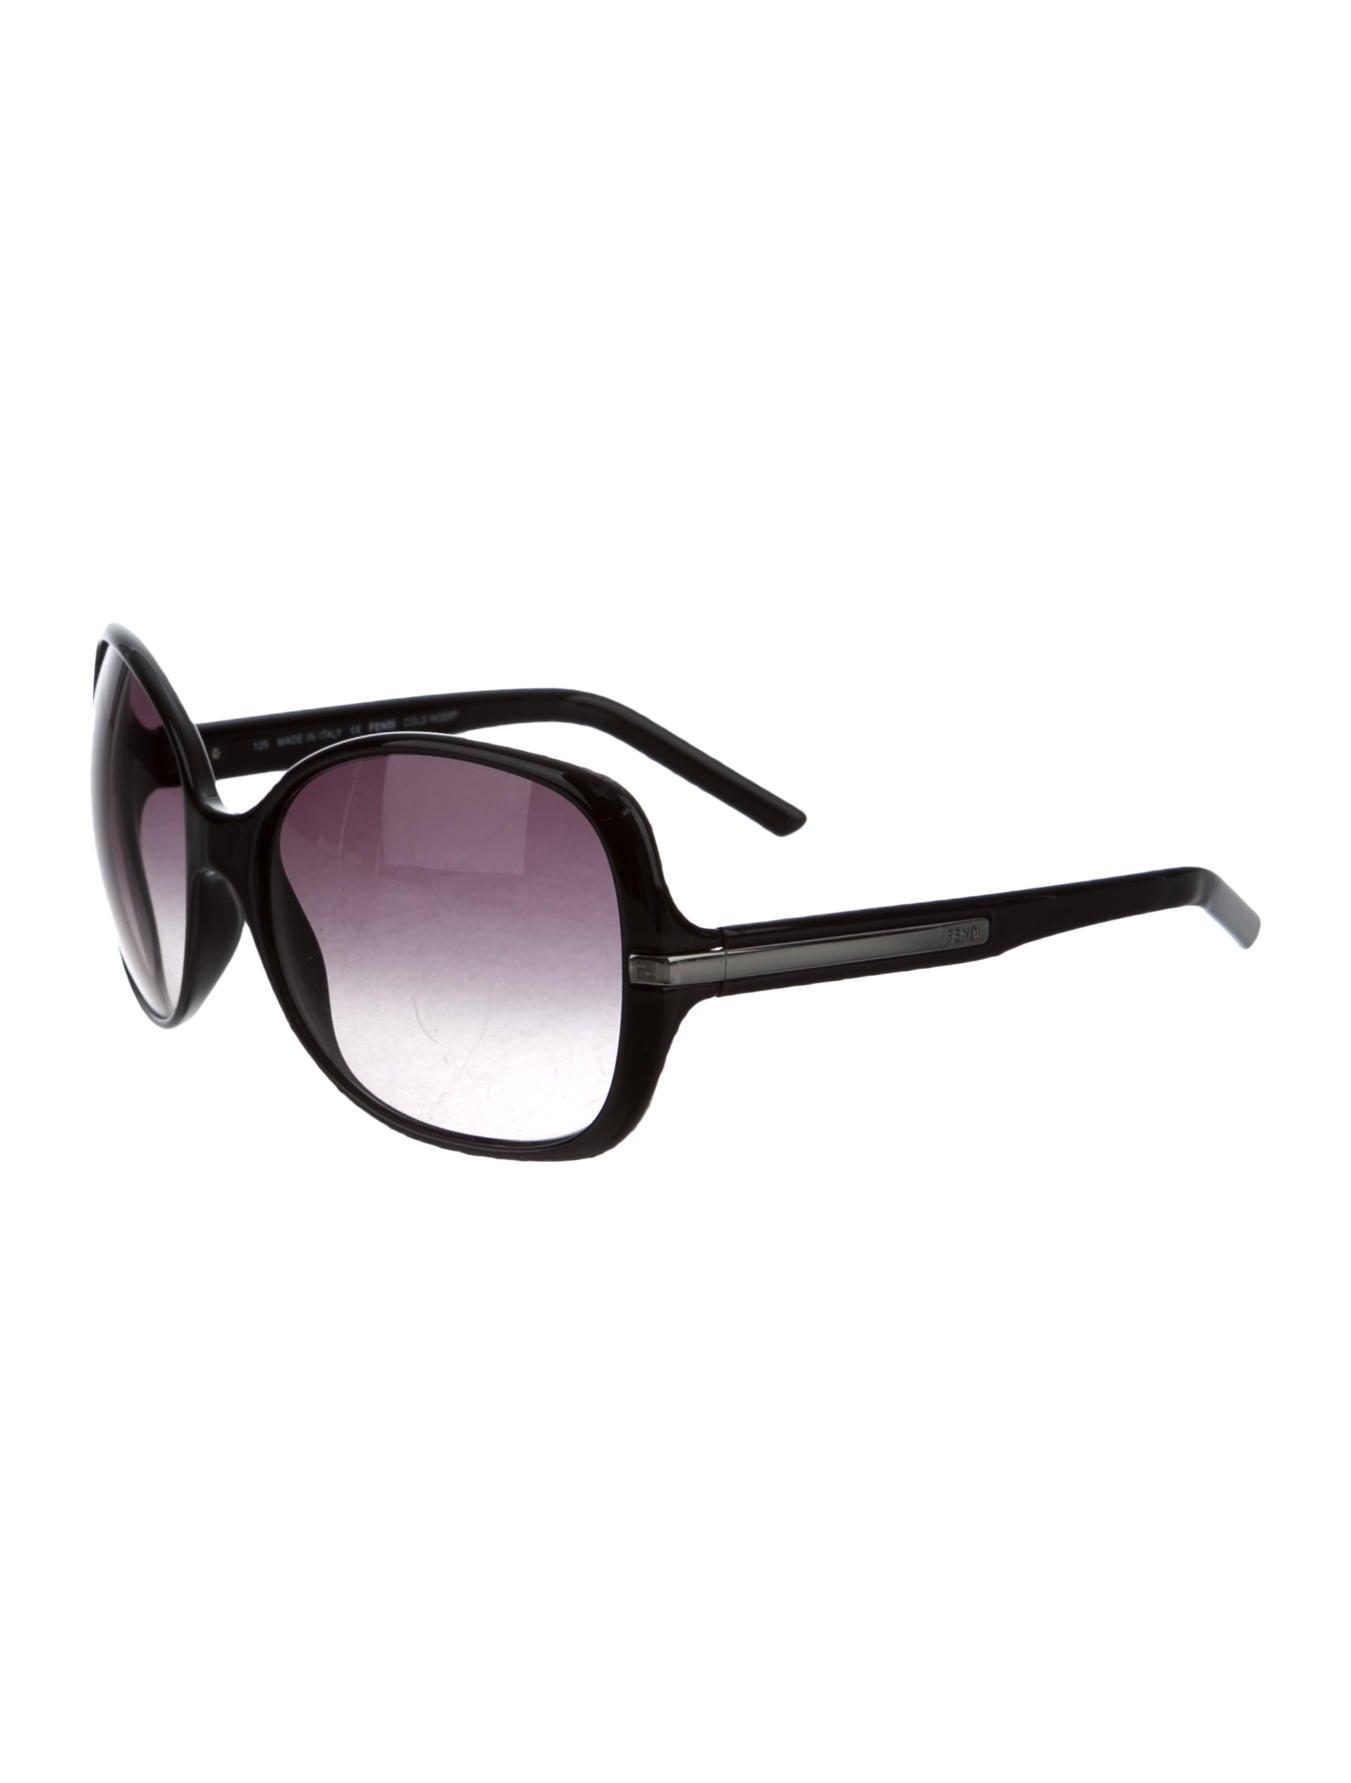 17070f1d8e90 Fendi Logo Lens Sunglasses